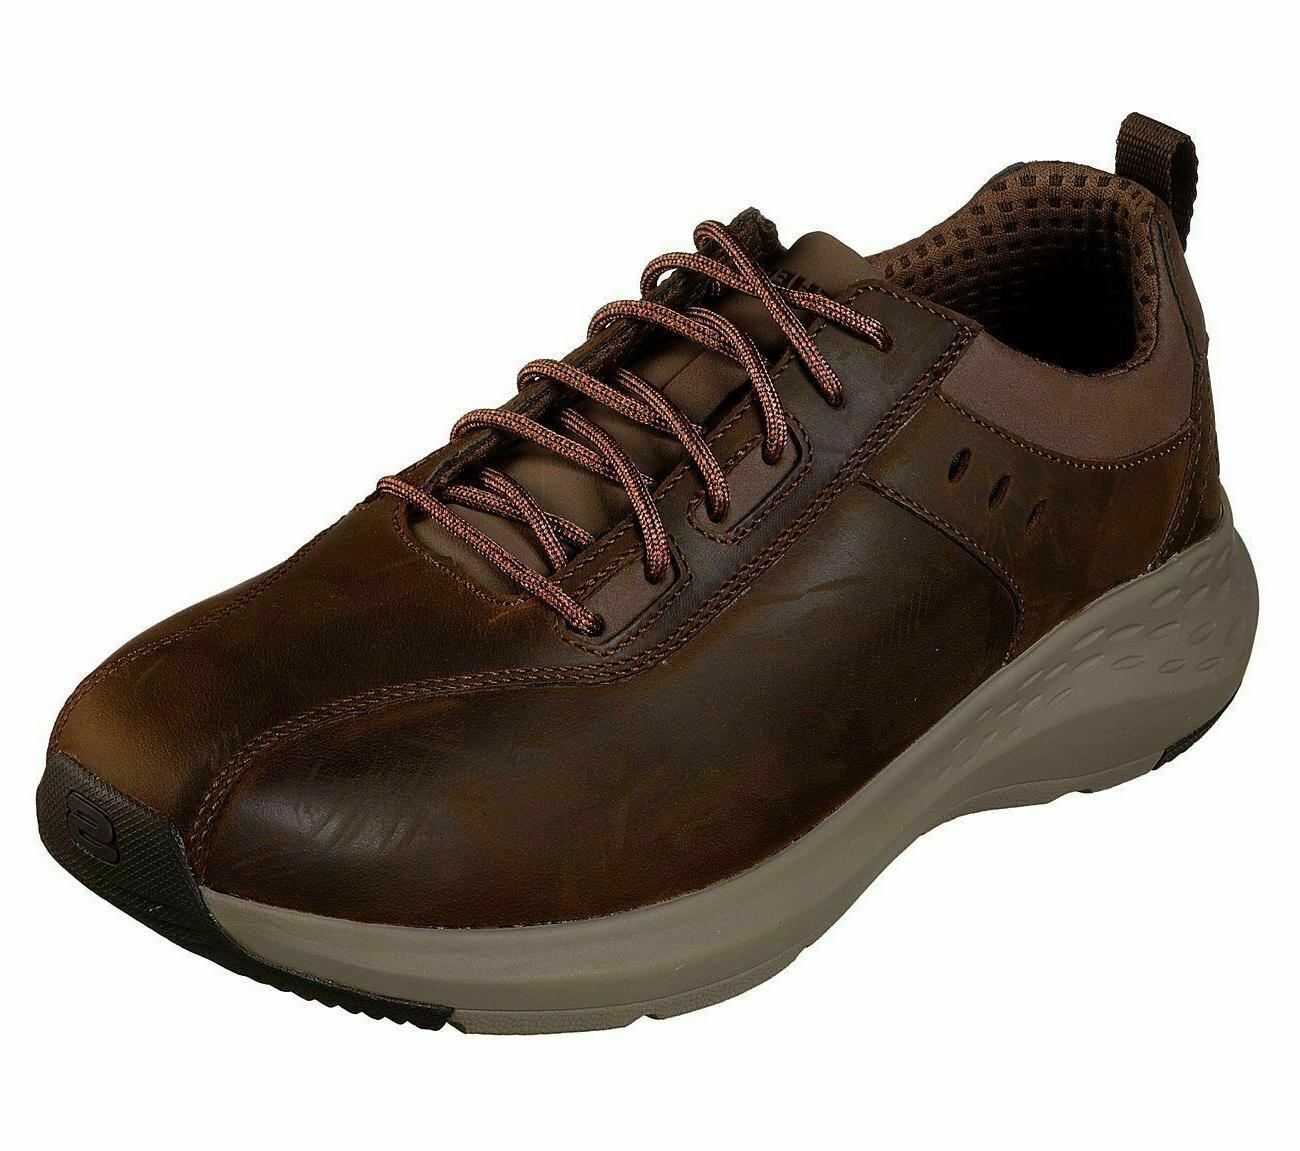 Leather Skechers Brown Shoes Men Memory Foam Sporty Casual C